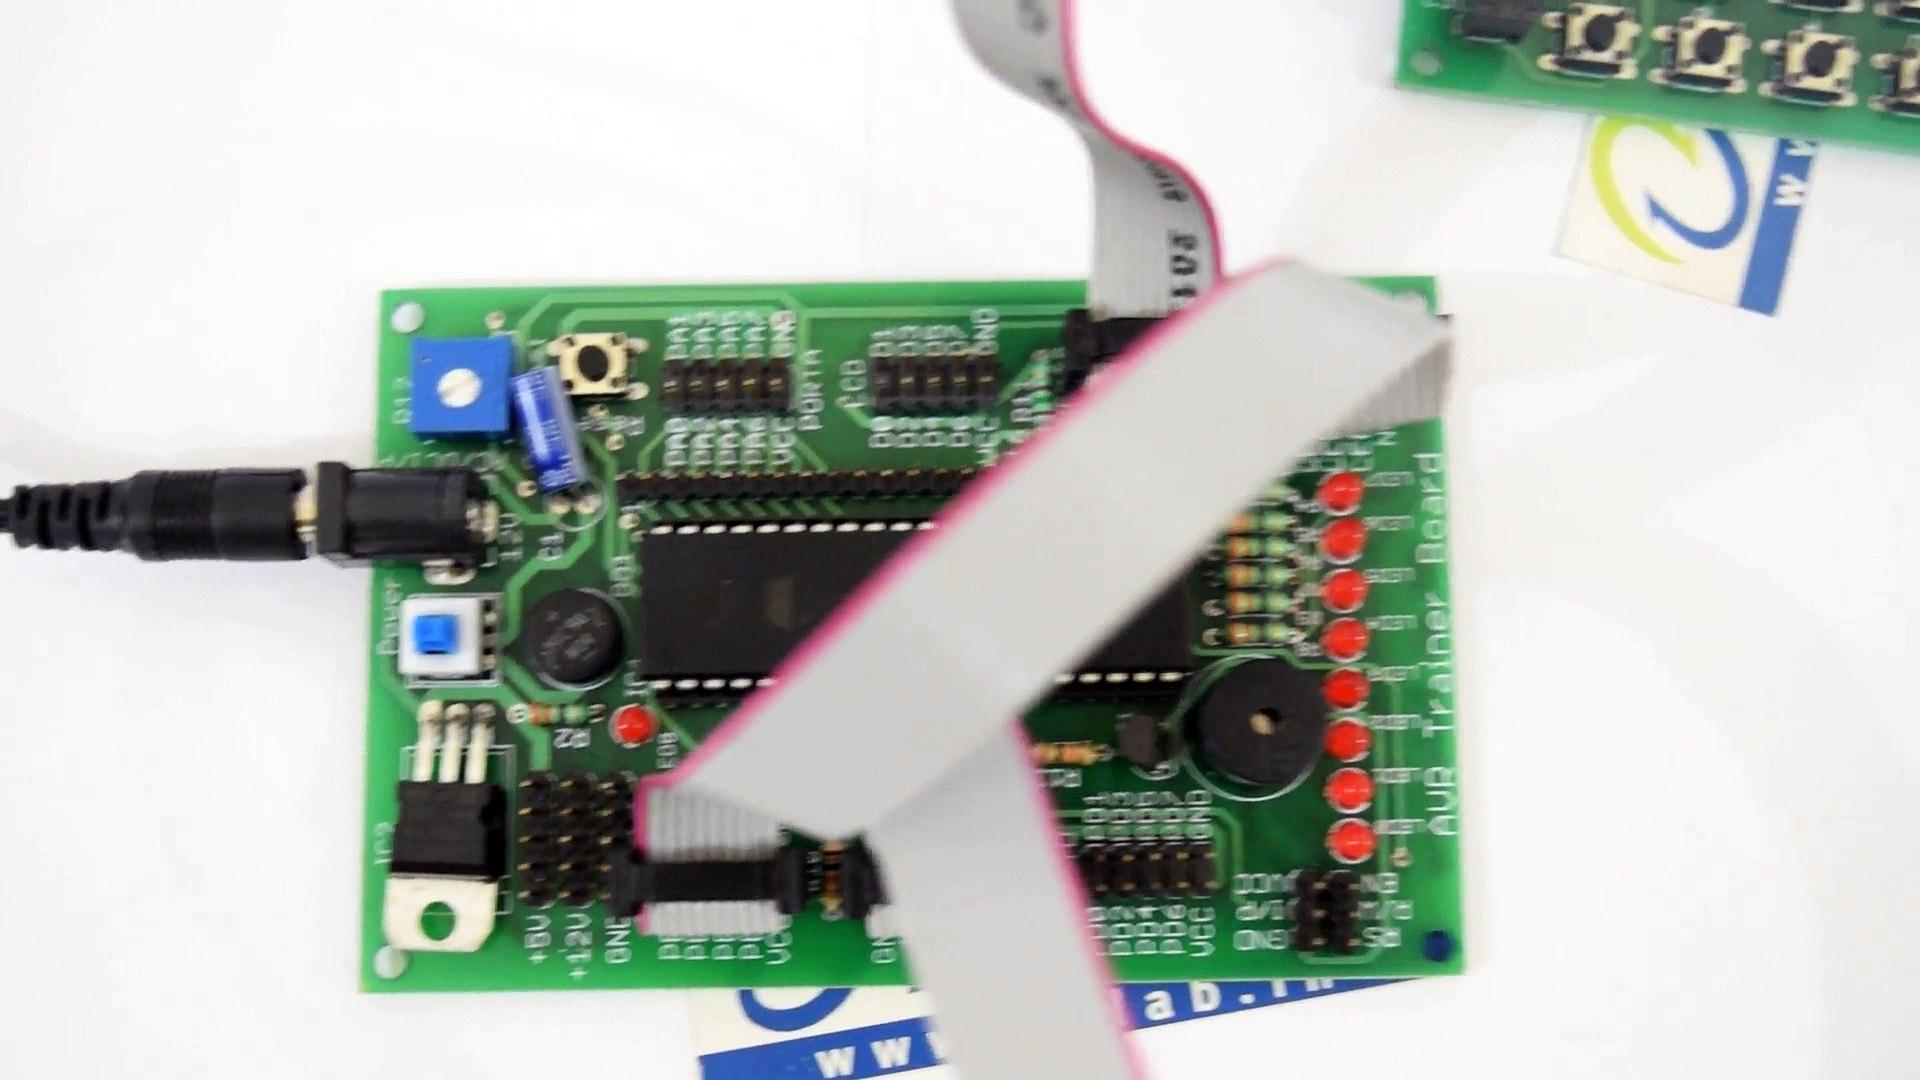 4X4 Keypad Interfacing with ATmega16 and LED Display